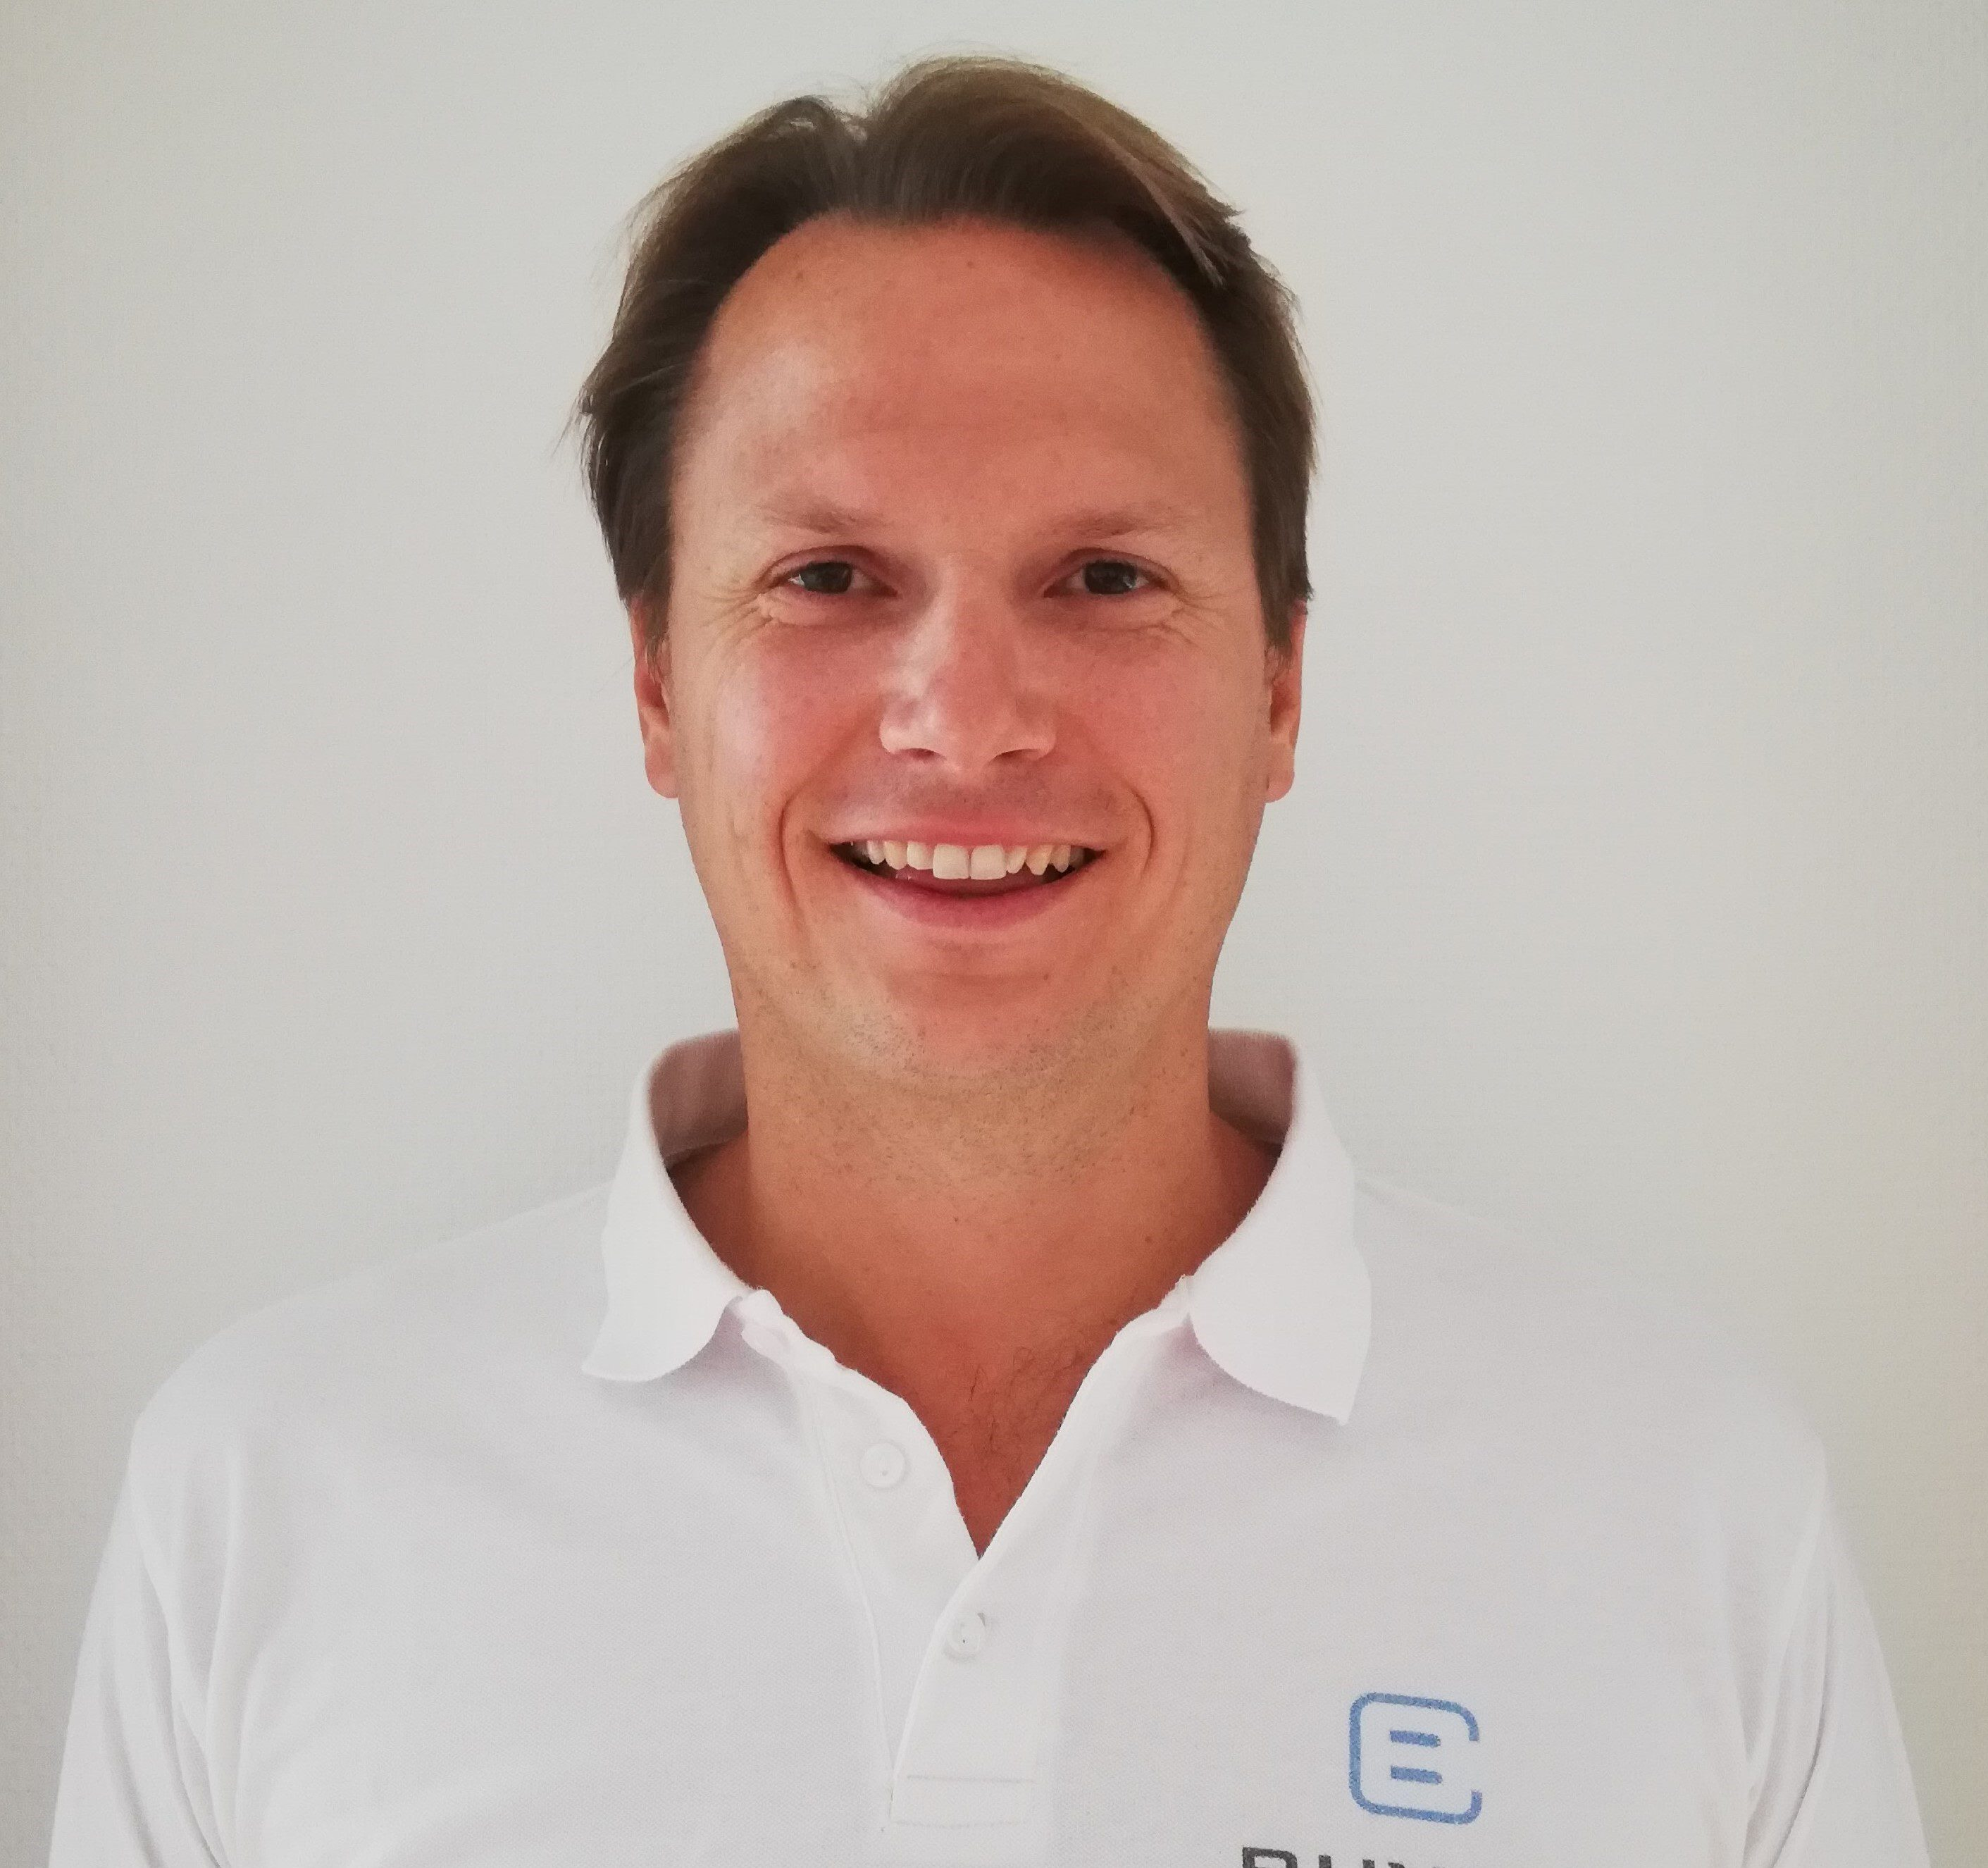 Nils Schaer